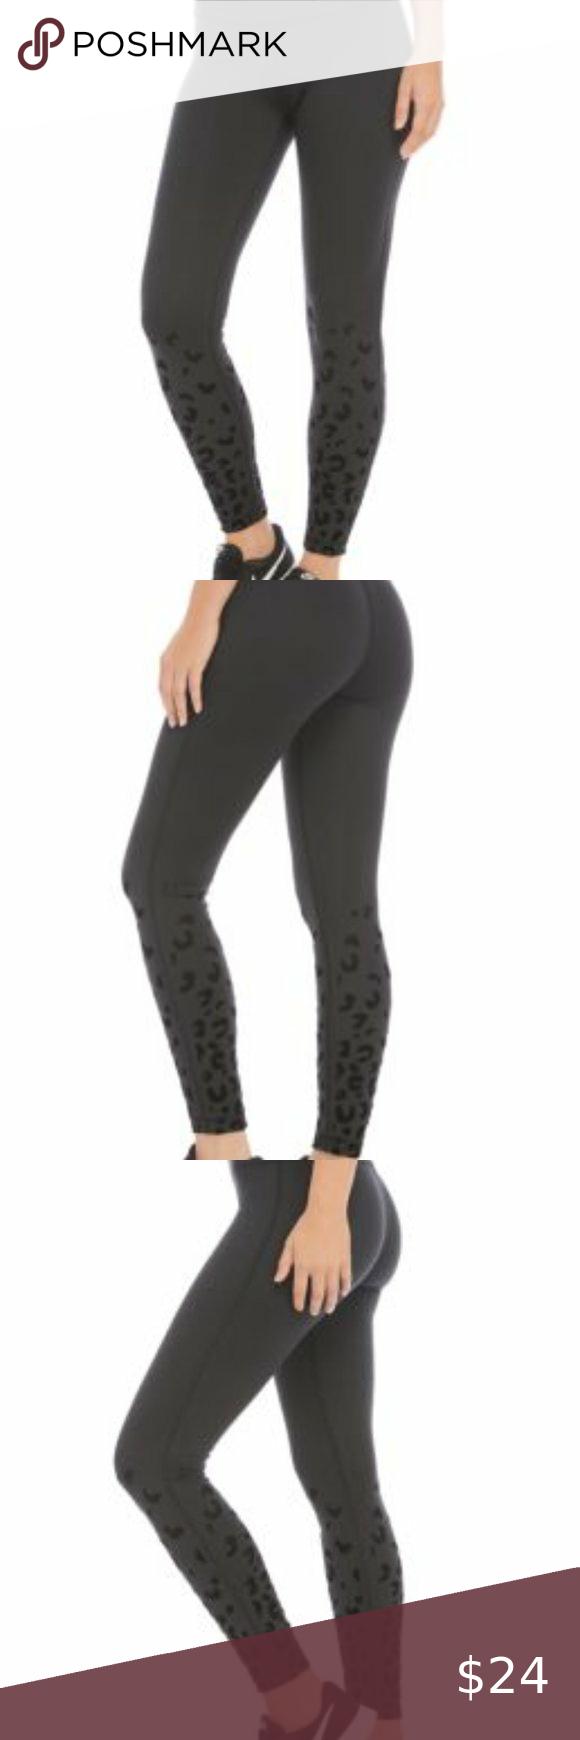 ZELOS Women/'s Workout Leggings Black Blue Polyester Spandex Plus Size 3X